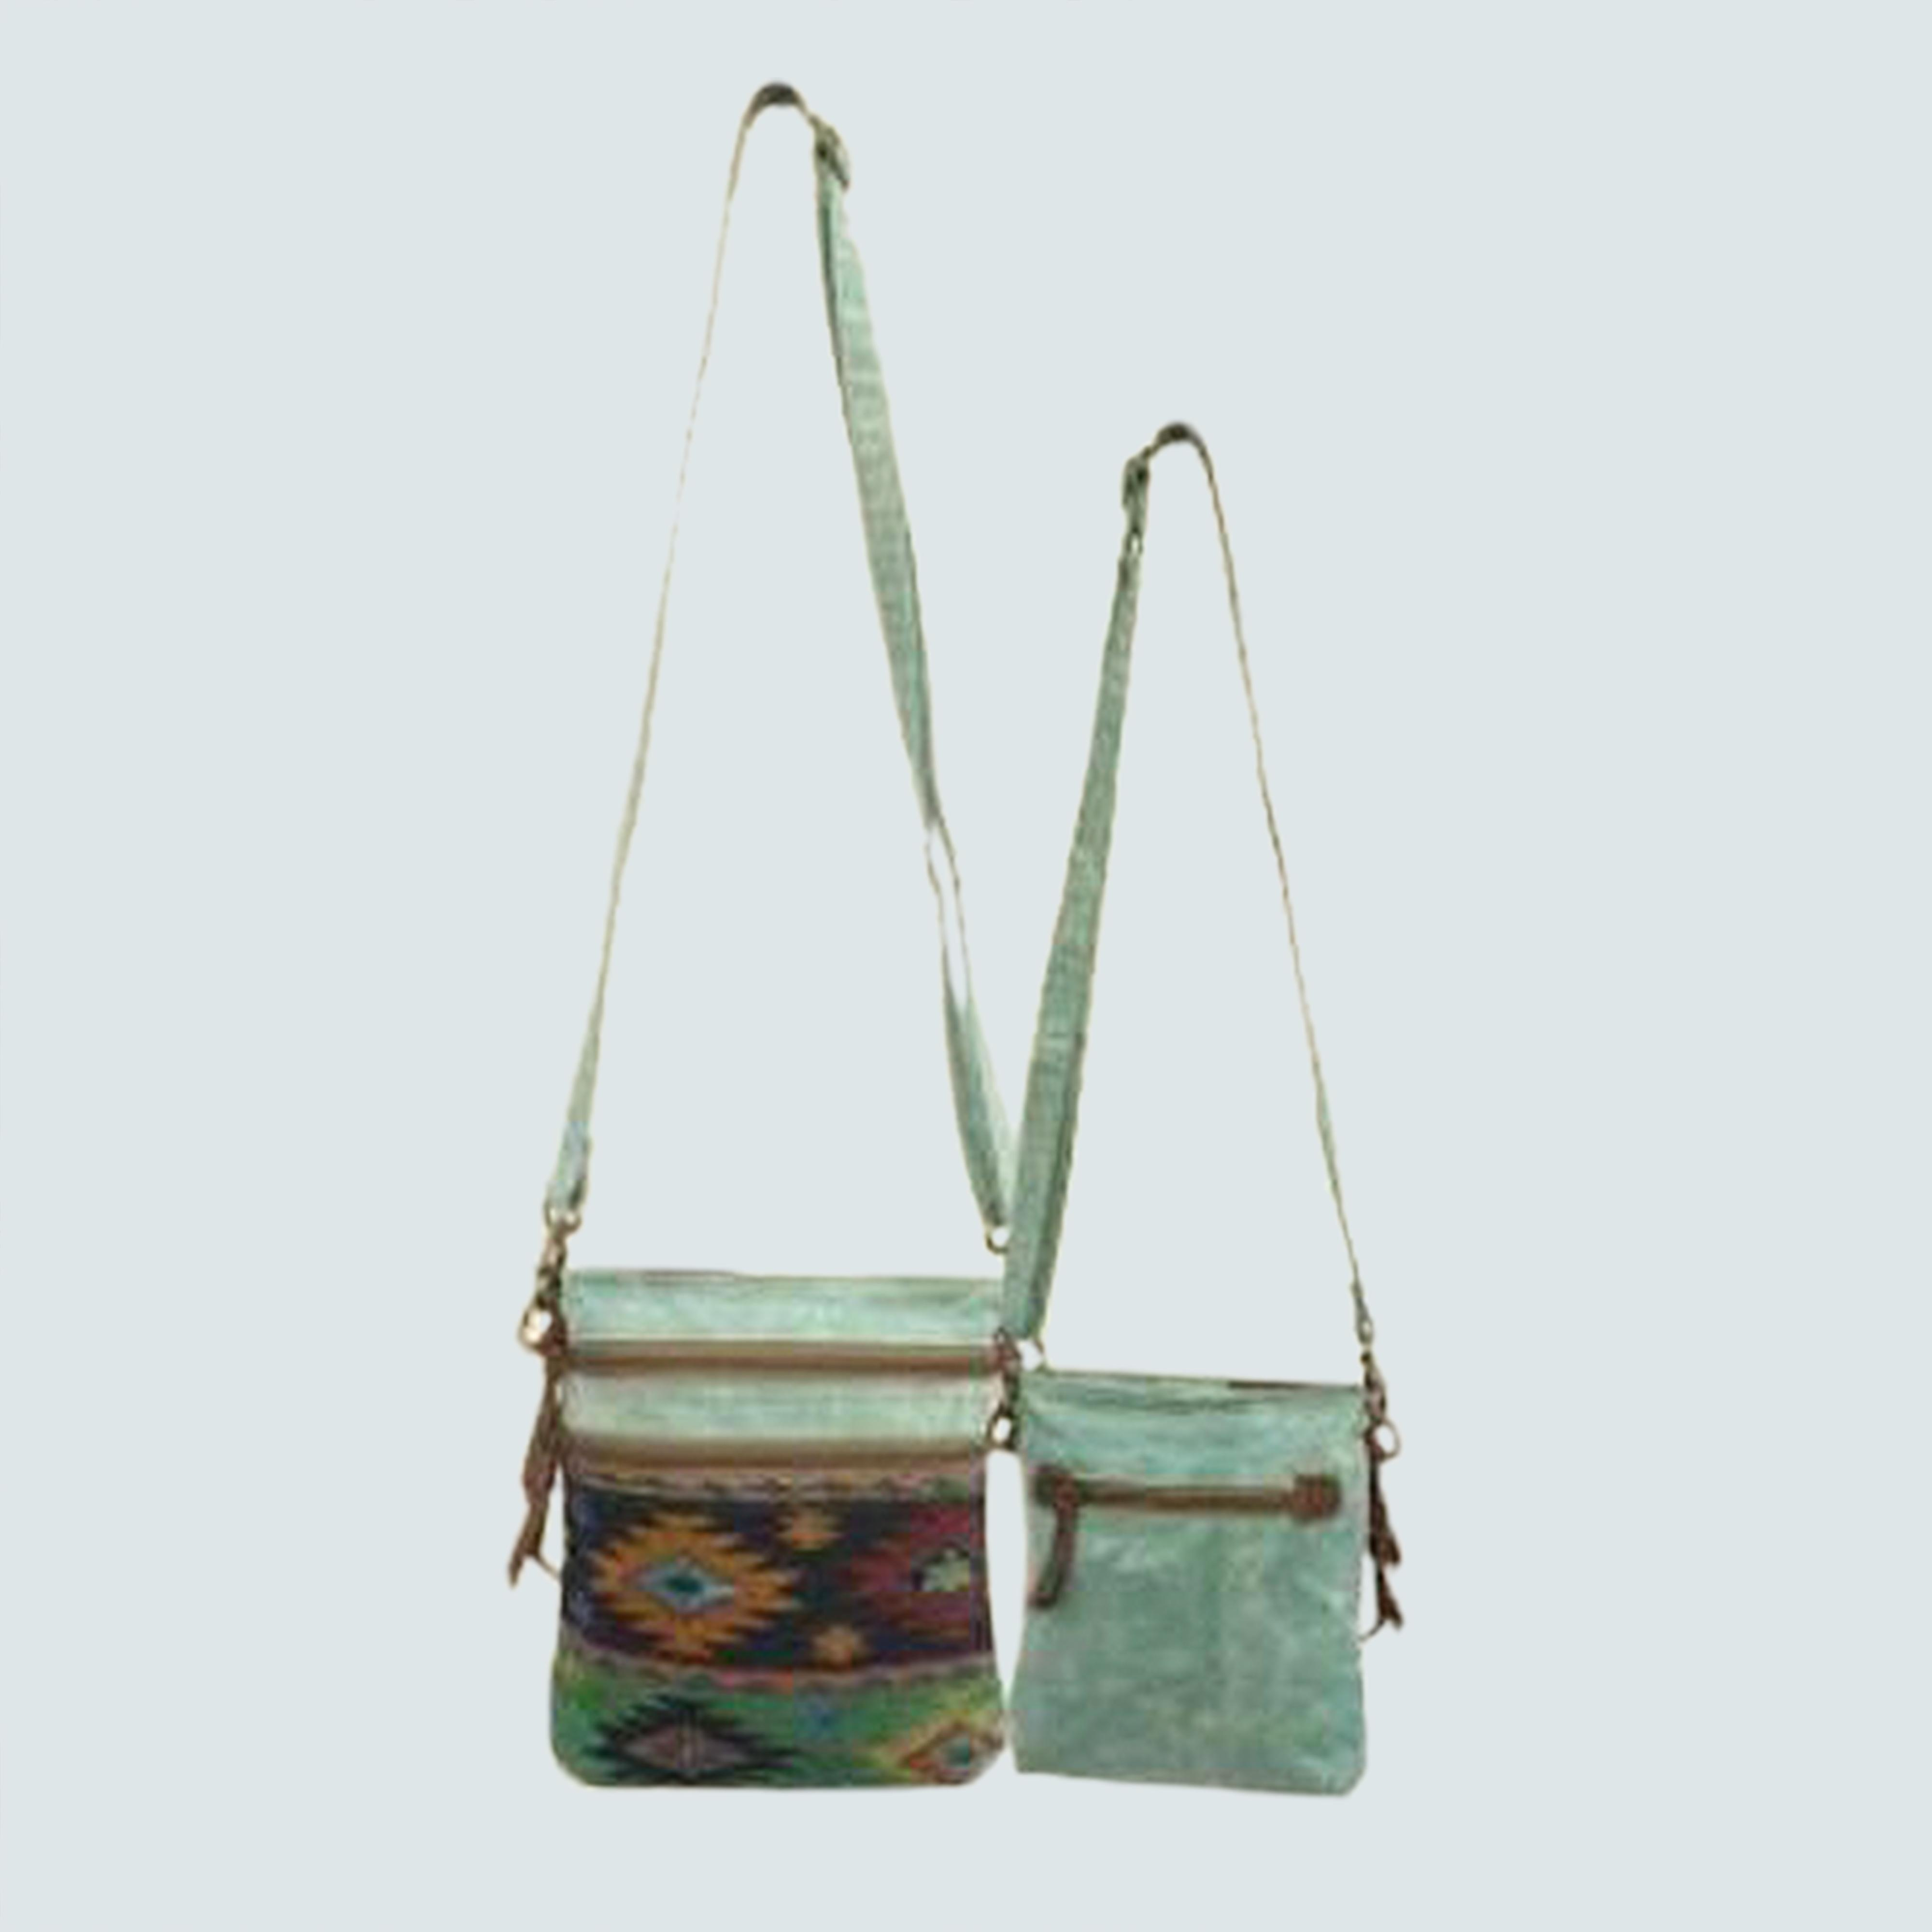 Handbags Shoulder Bags Totes Purses, Shopping Bag for women